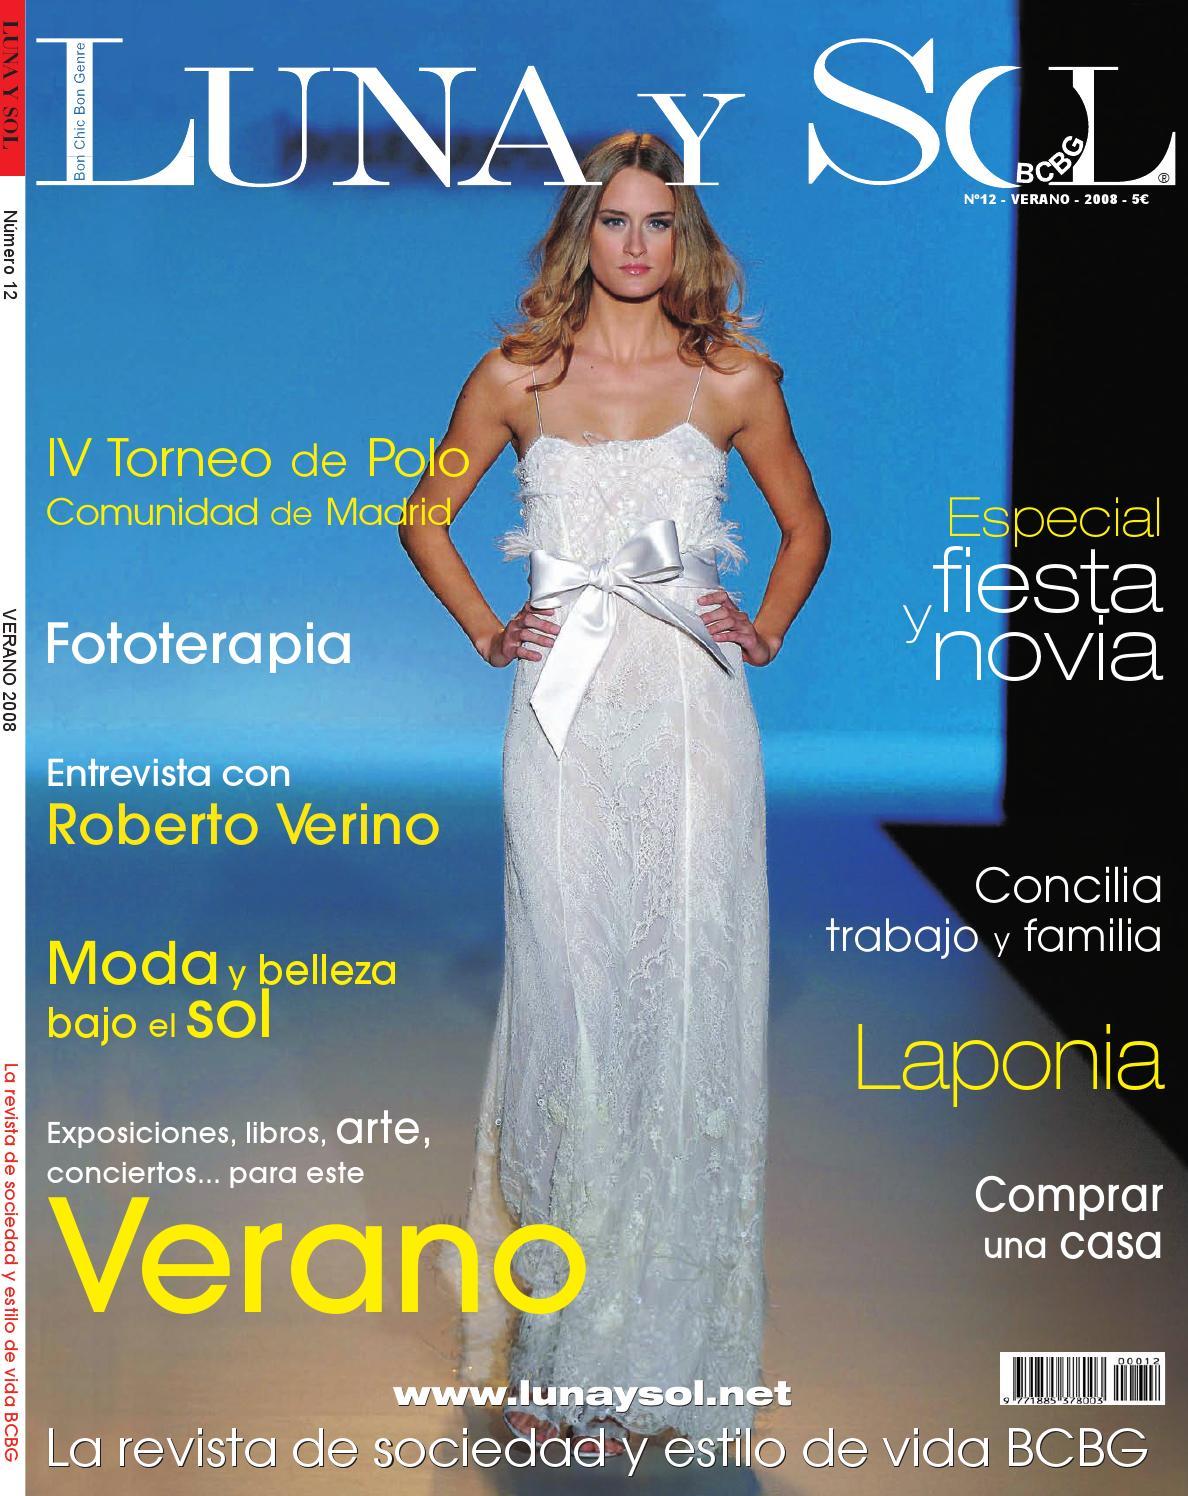 12-Verano08 LUNA Y SOL by LUNA Y SOL - issuu